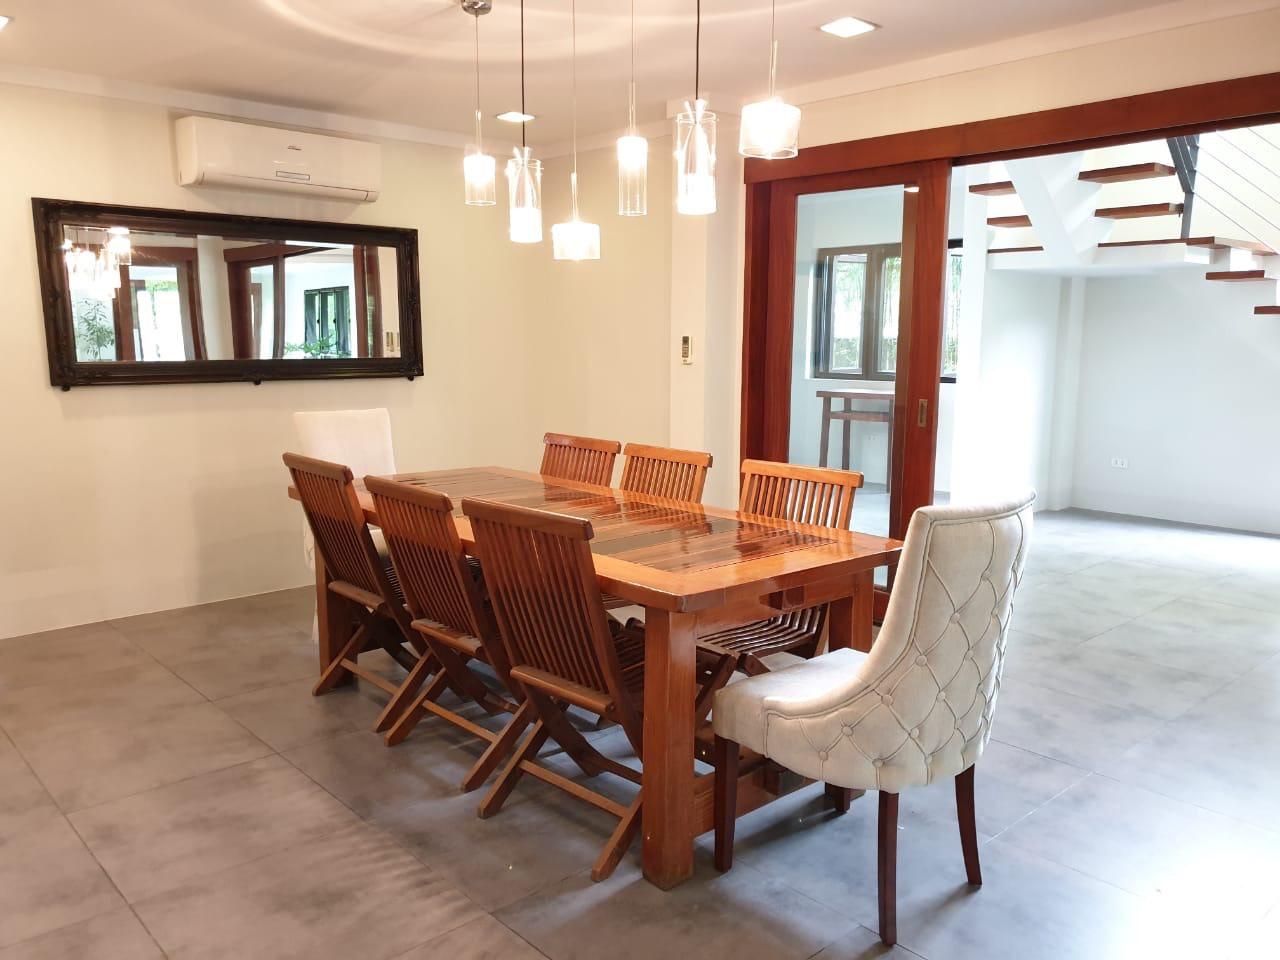 4 Bedrooms House For Sale, Ayala Alabang 13